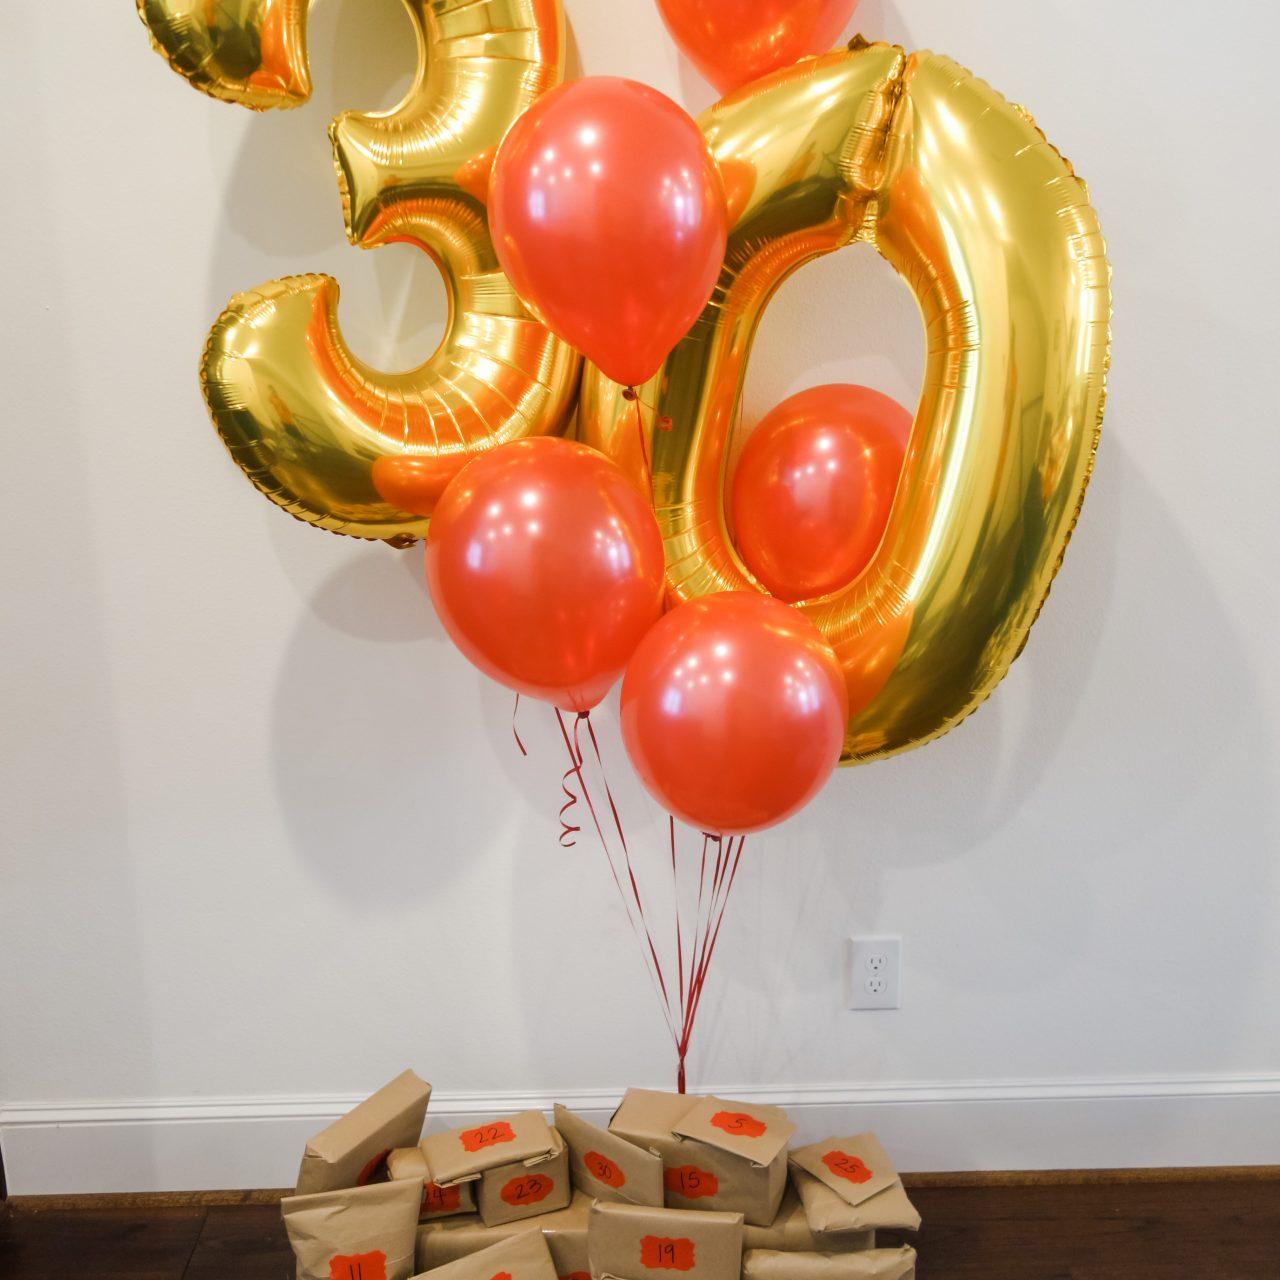 30th Birthday Inspo (For Him)